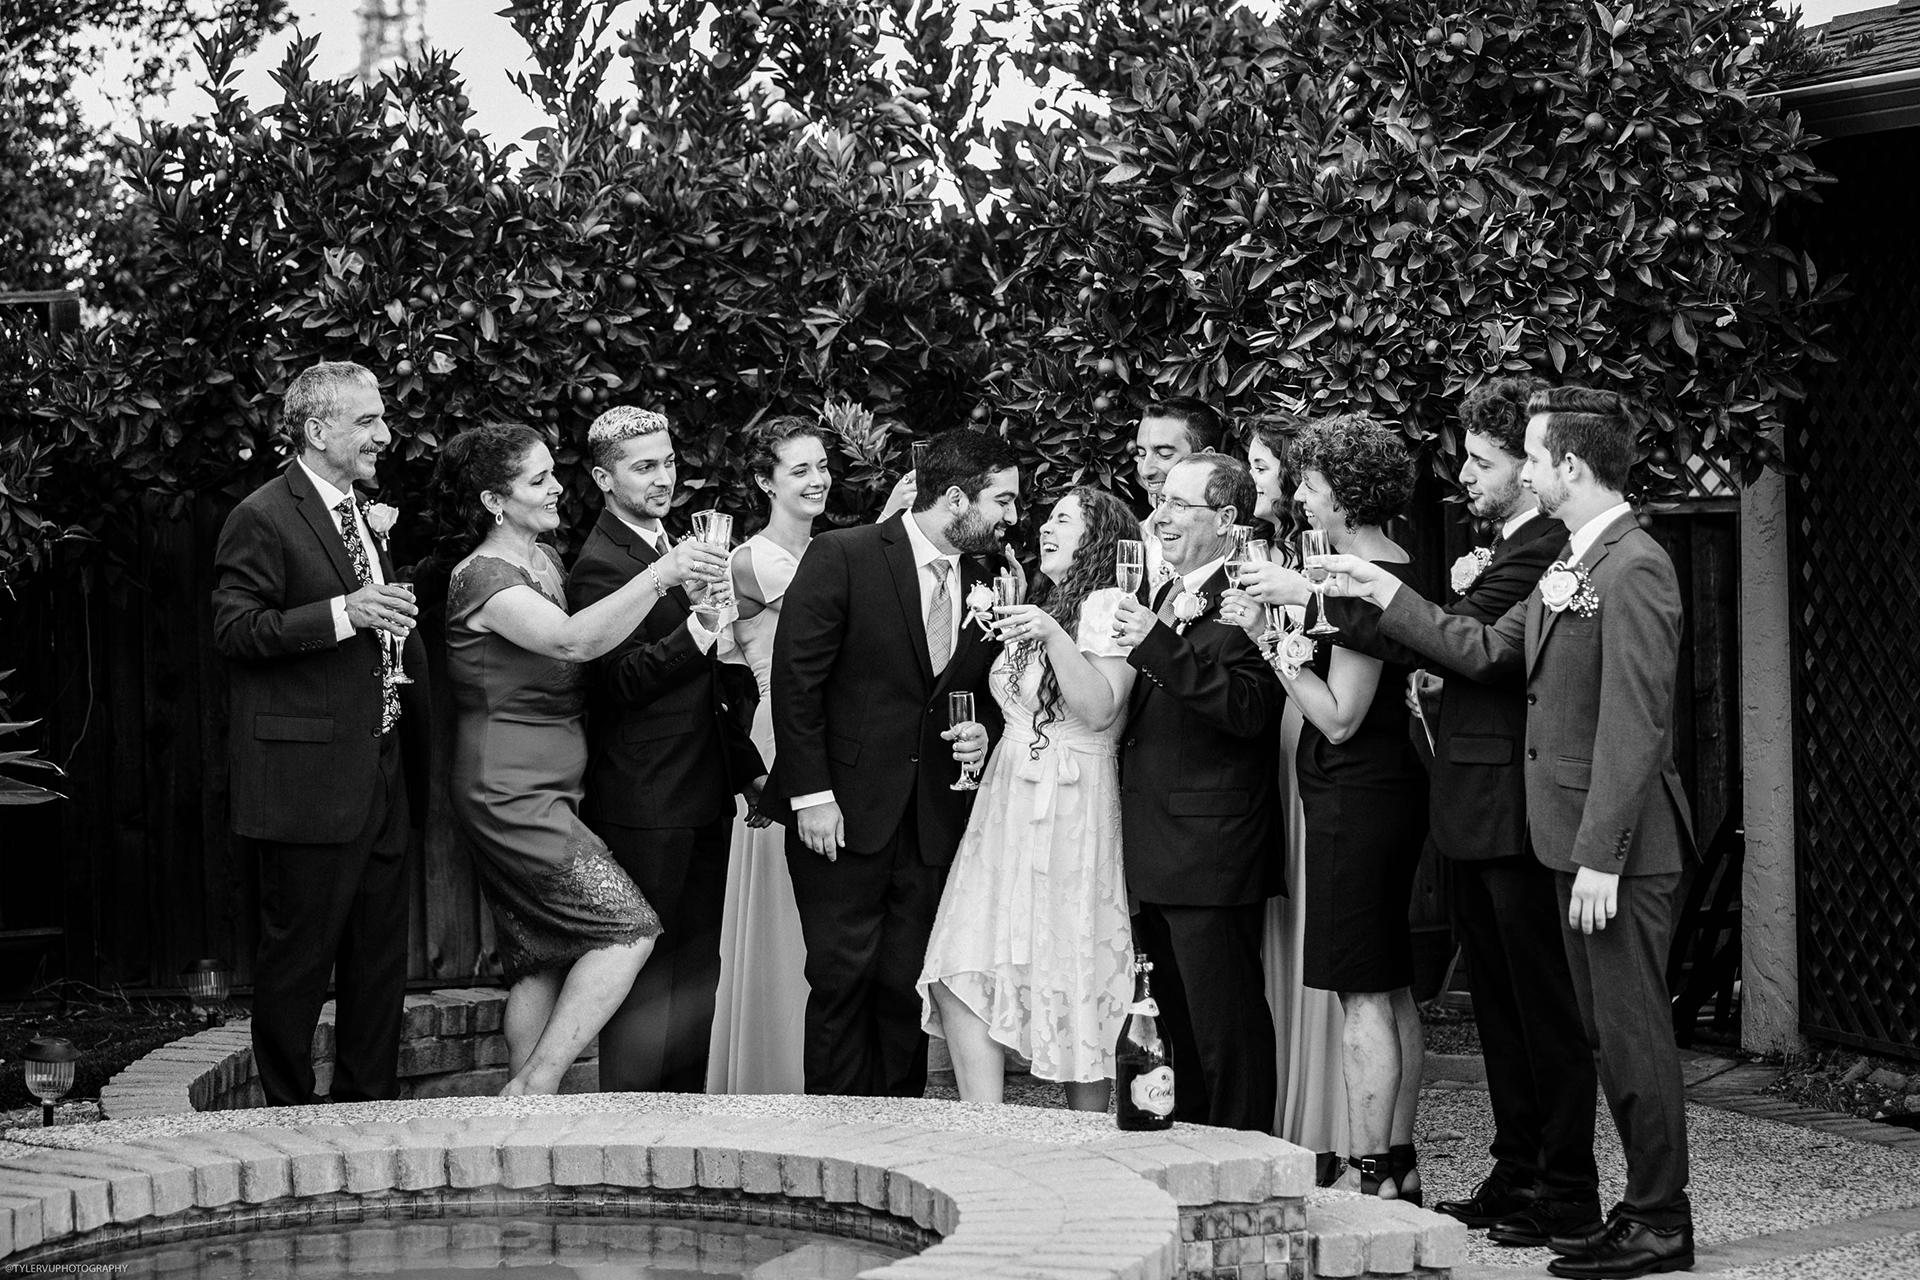 California Backyard Elopement Reception Toast Photo | Still enjoying the beautiful sunshine, guests gather around the couple